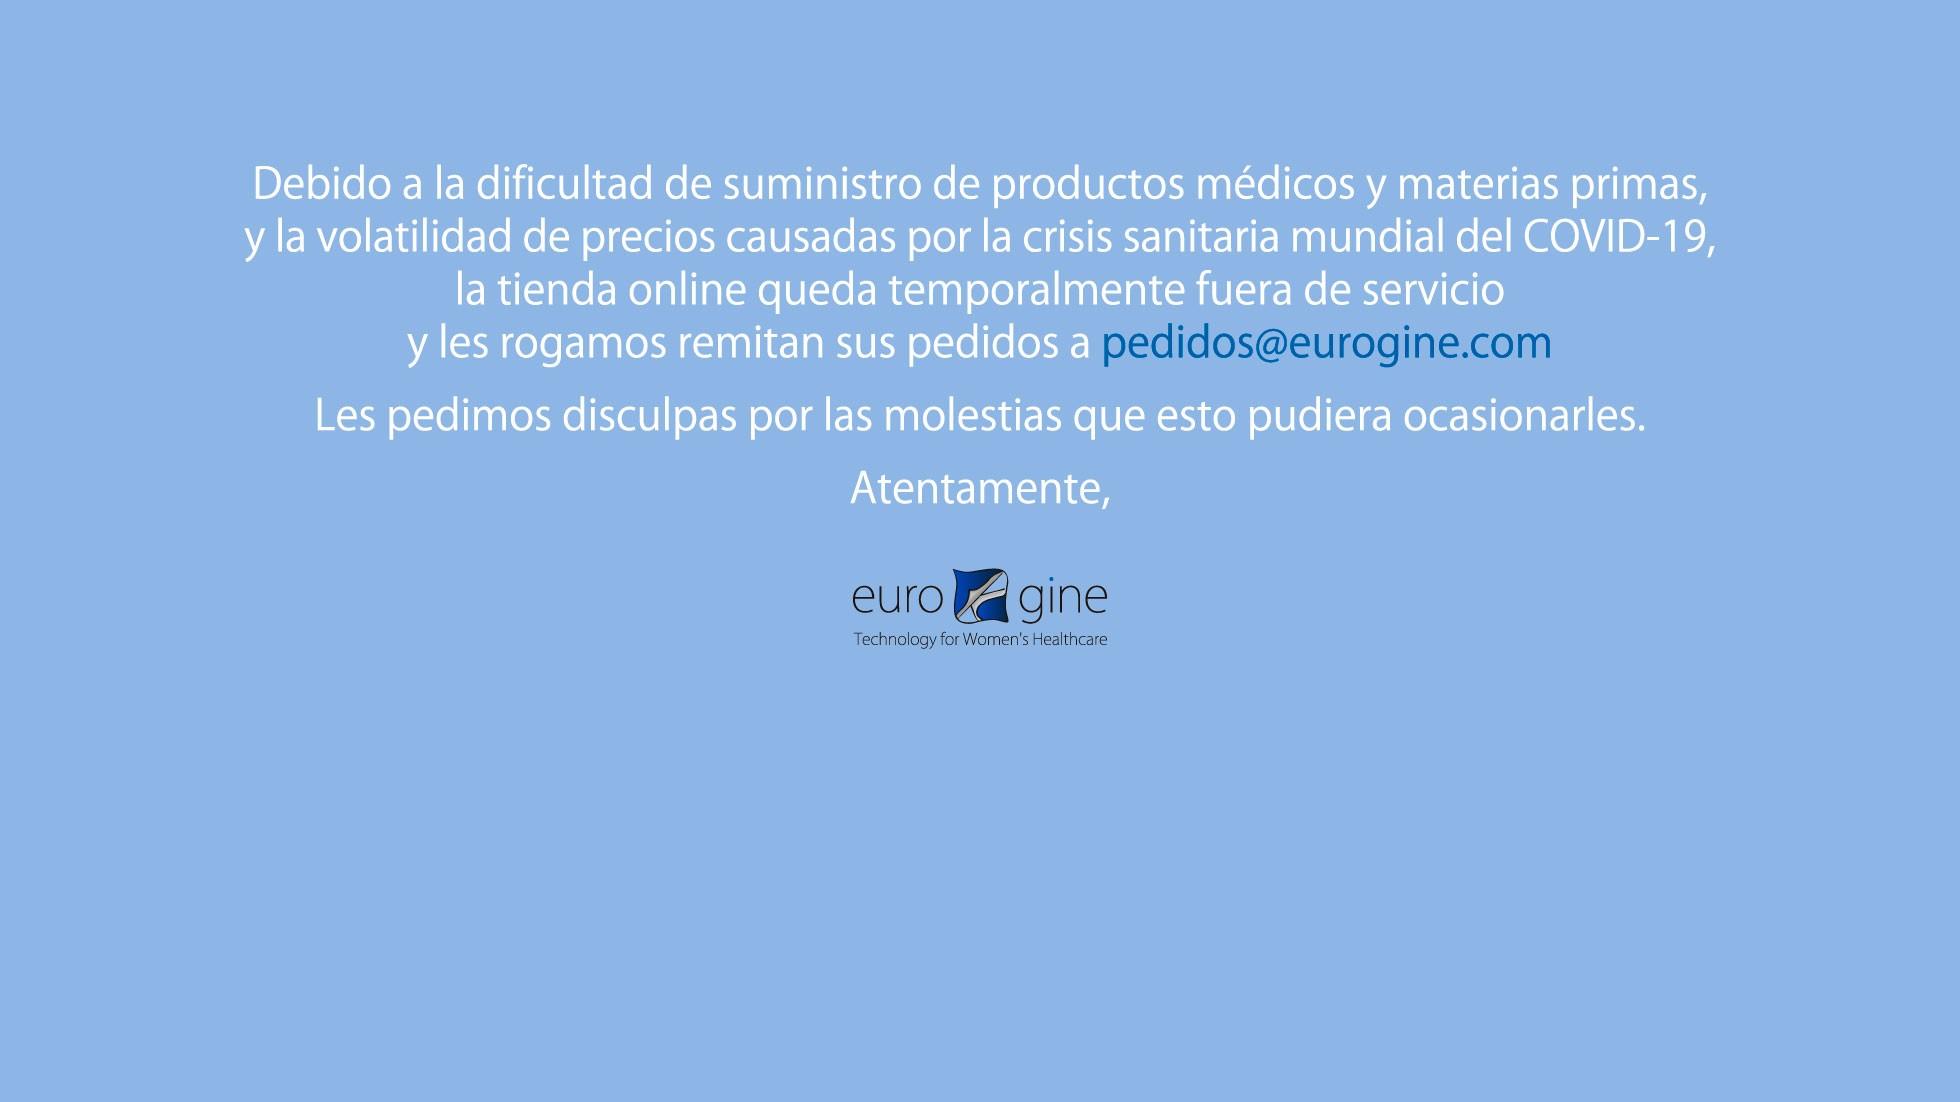 Eurogine